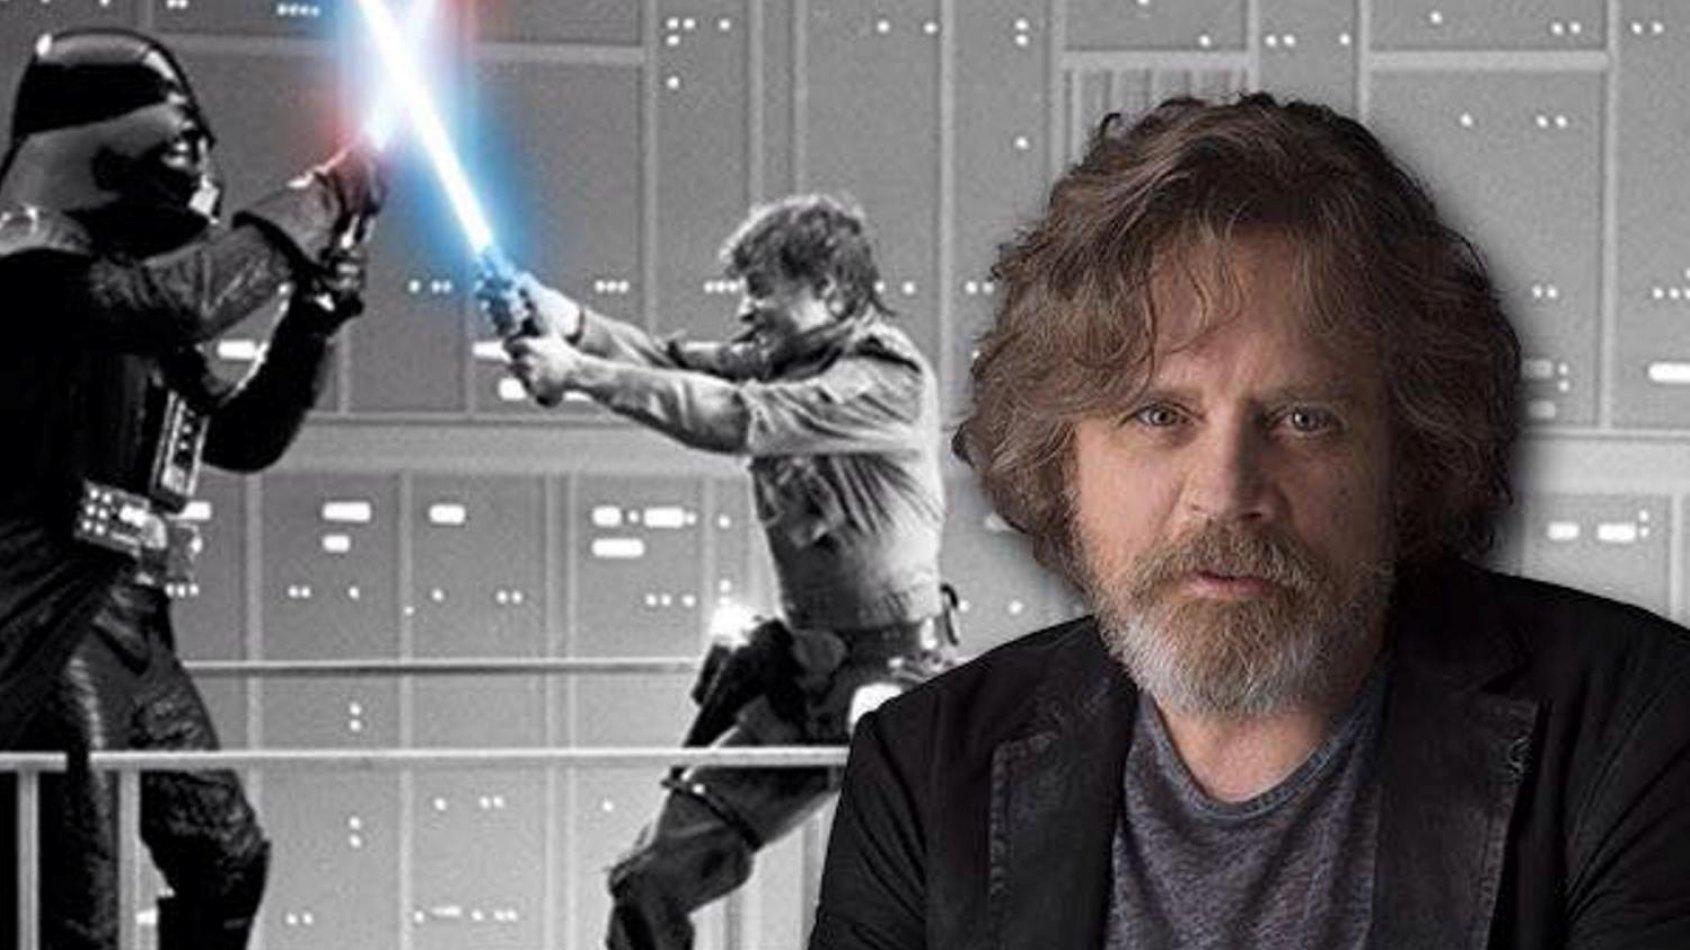 Mark Hamill sera présent à Star Wars Célébration Europe à Londres